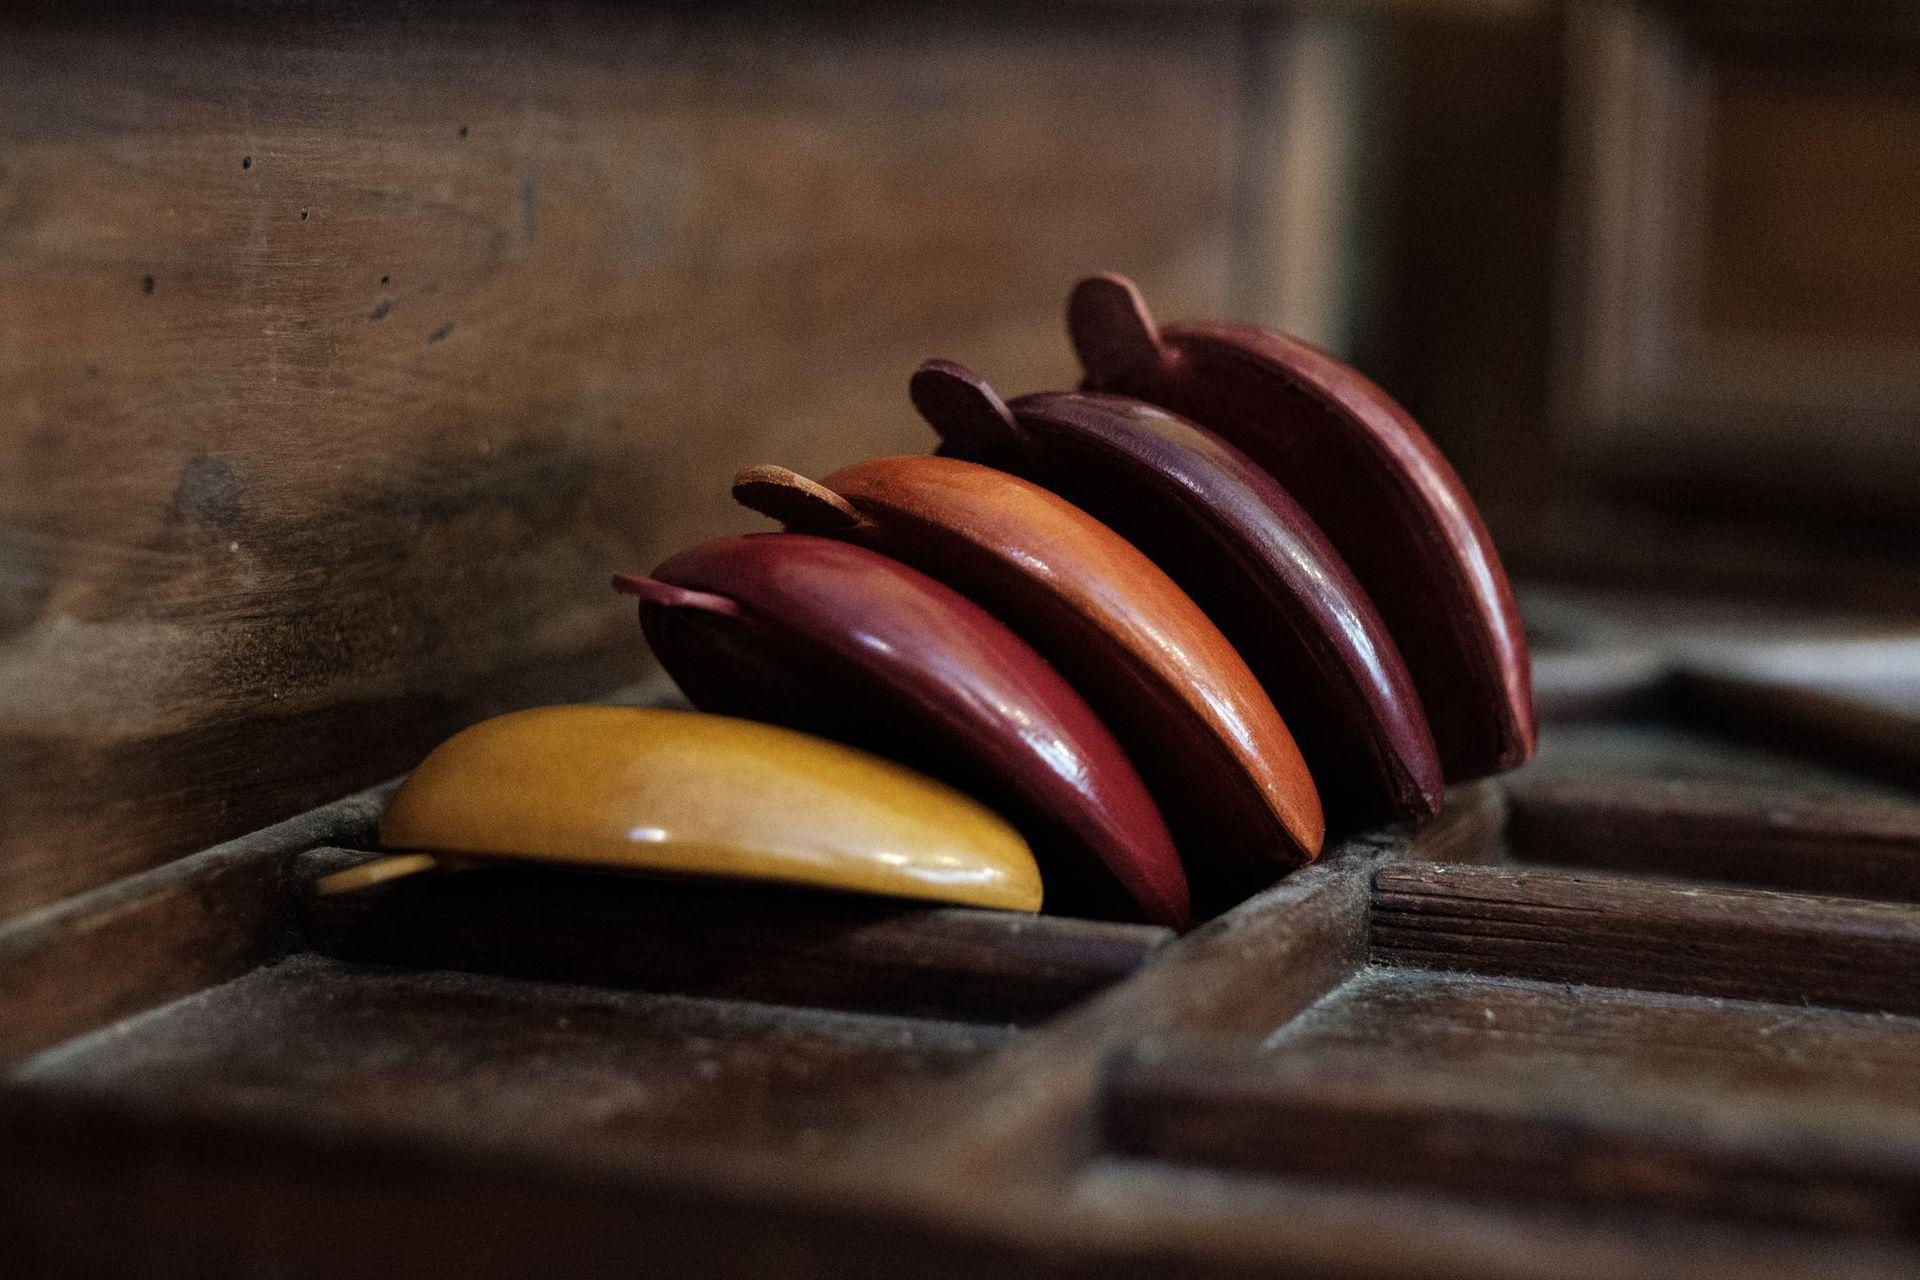 giuseppe-fanara-1989-leather-goods-manufacturers-firenze-thumbnail